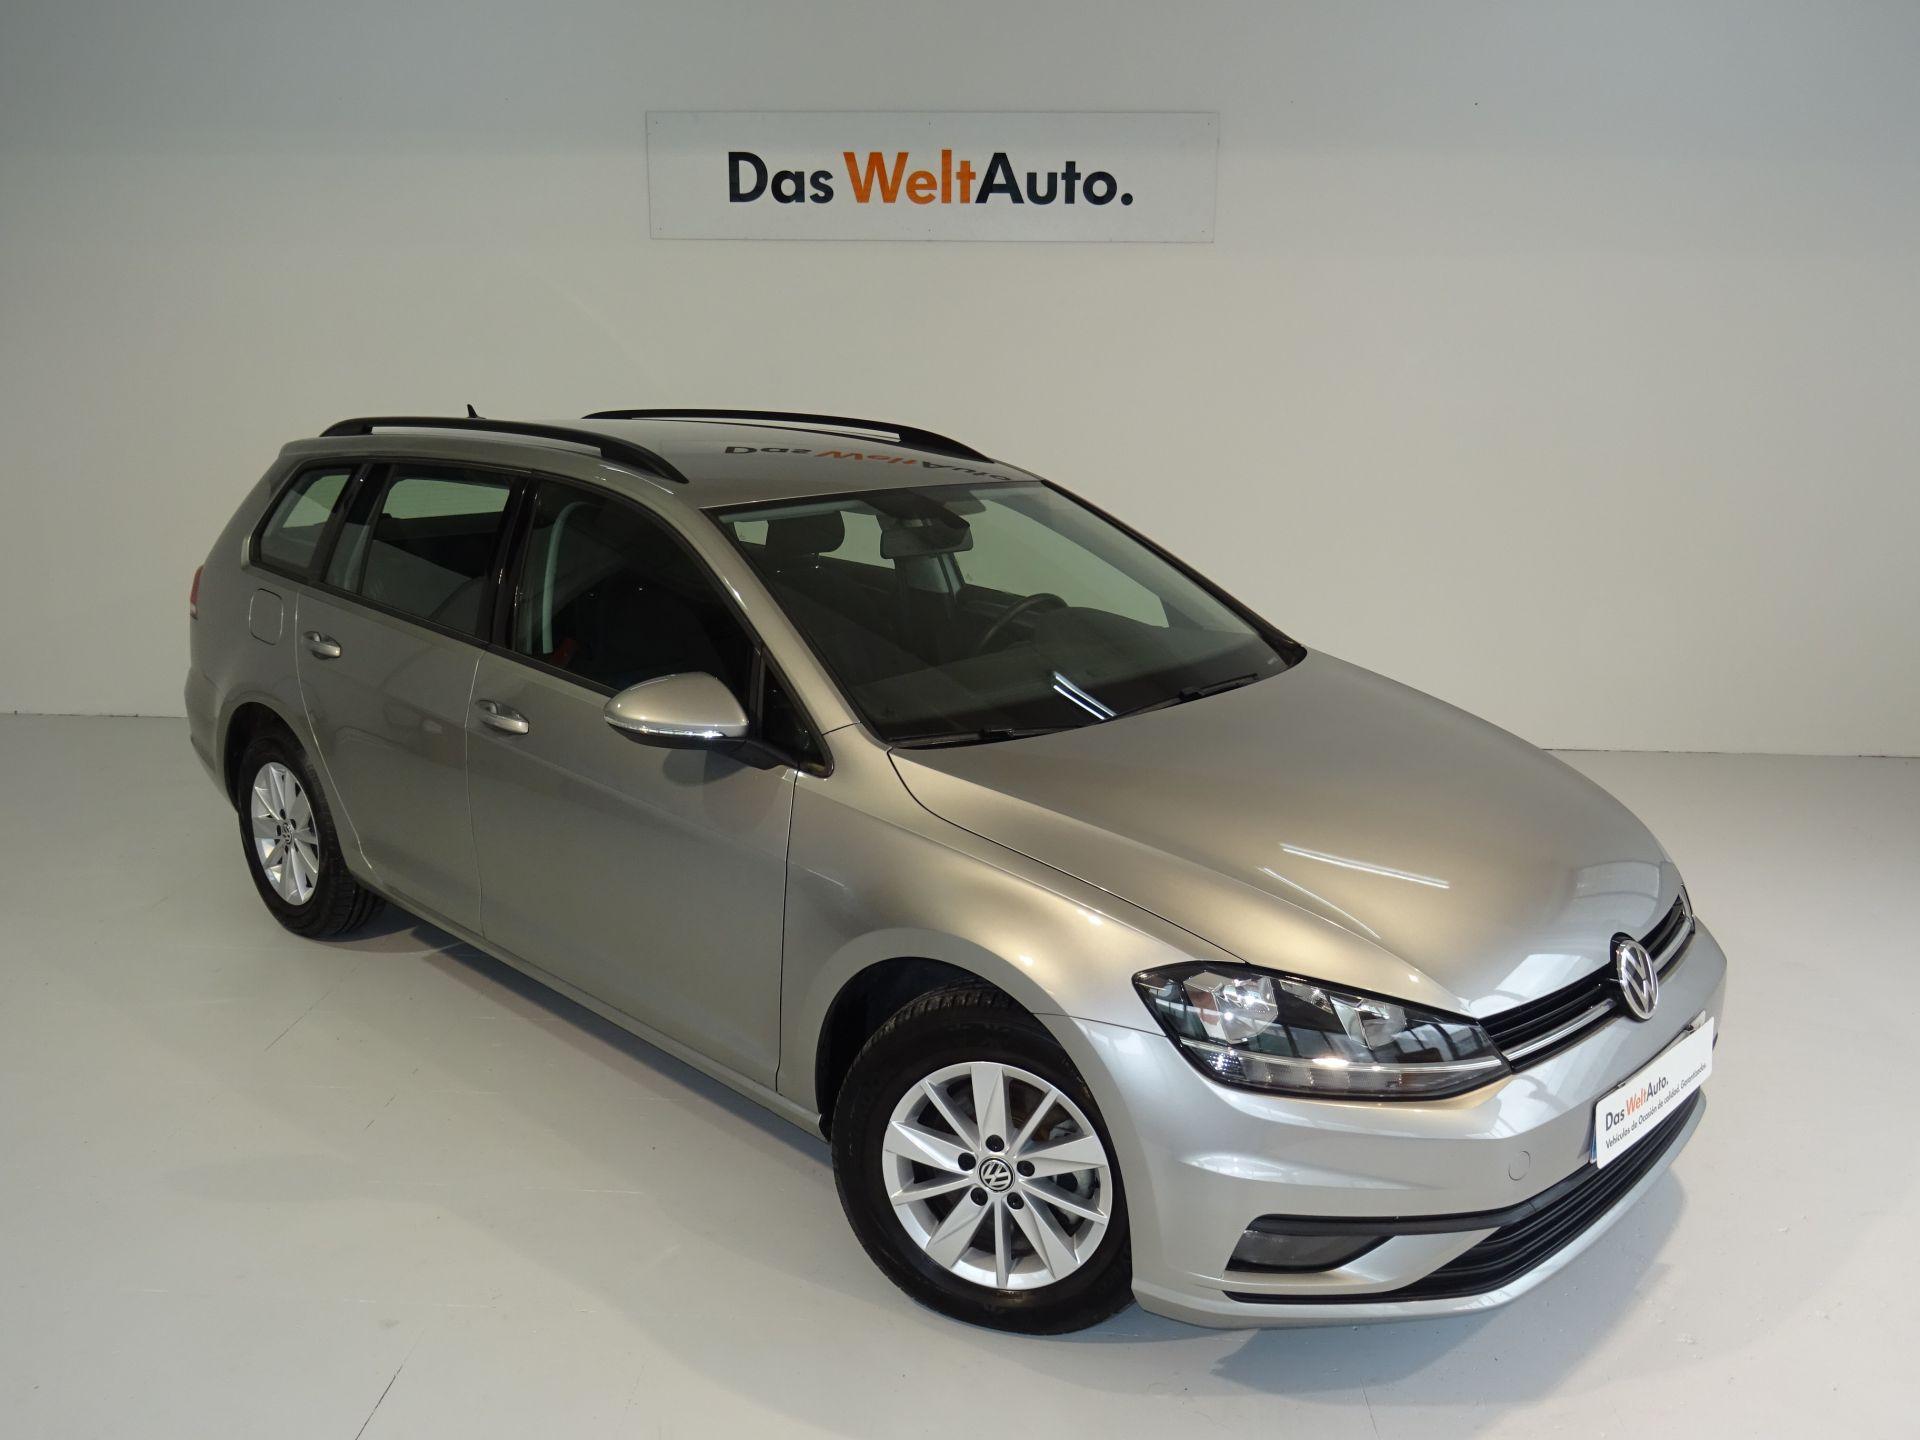 Volkswagen Golf Business 1.6 TDI 85kW (115CV) Variant